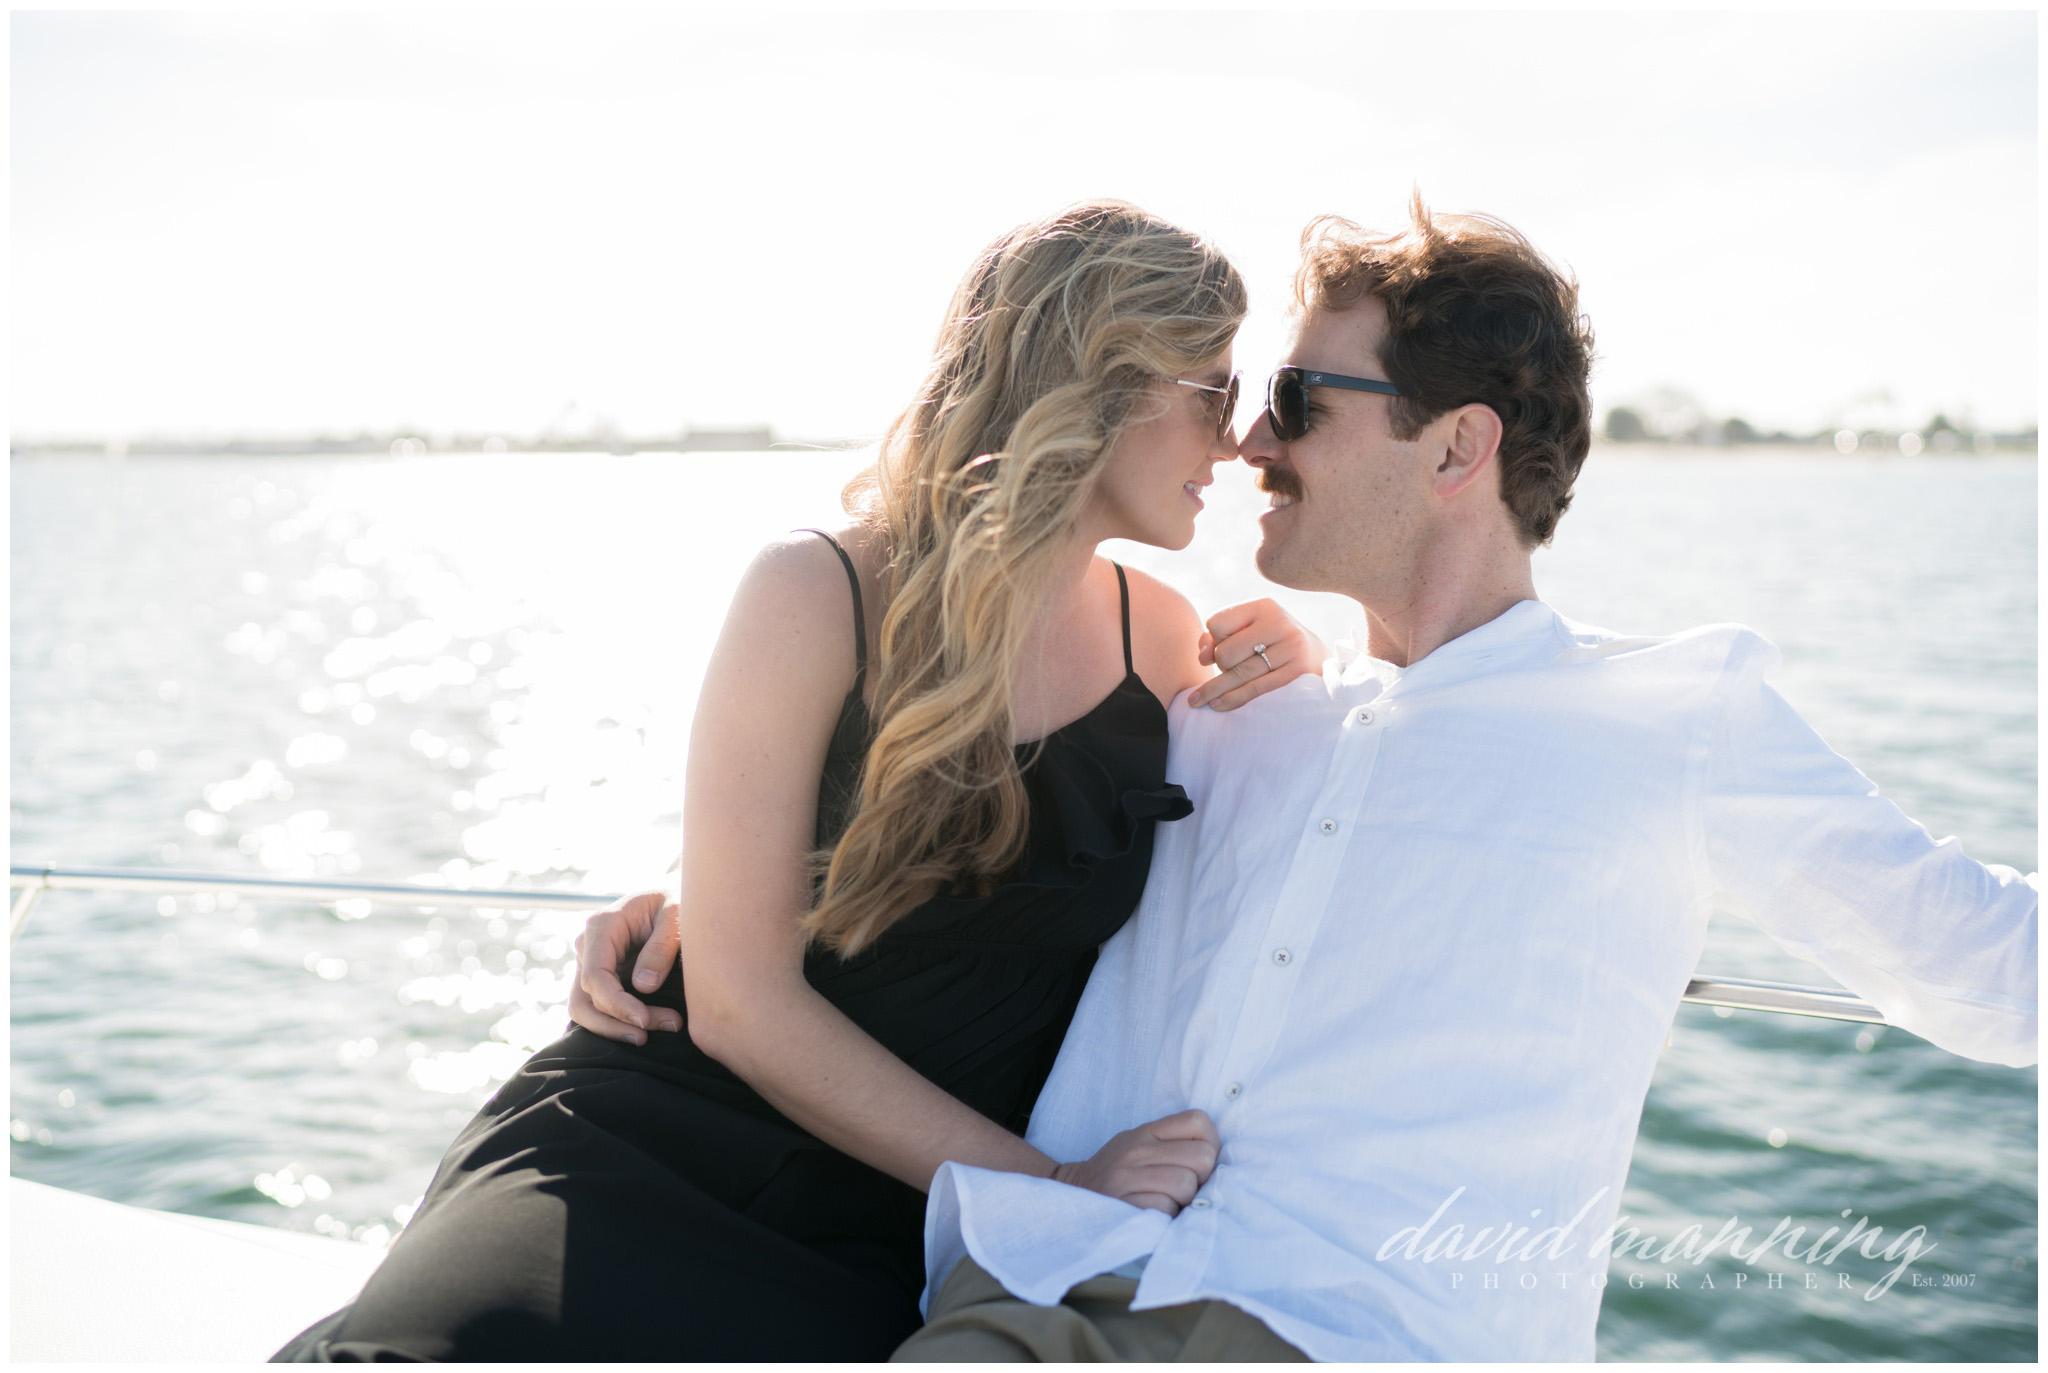 Alyssa-Taylor-Engagement-David-Manning-Photographer-0042.JPG